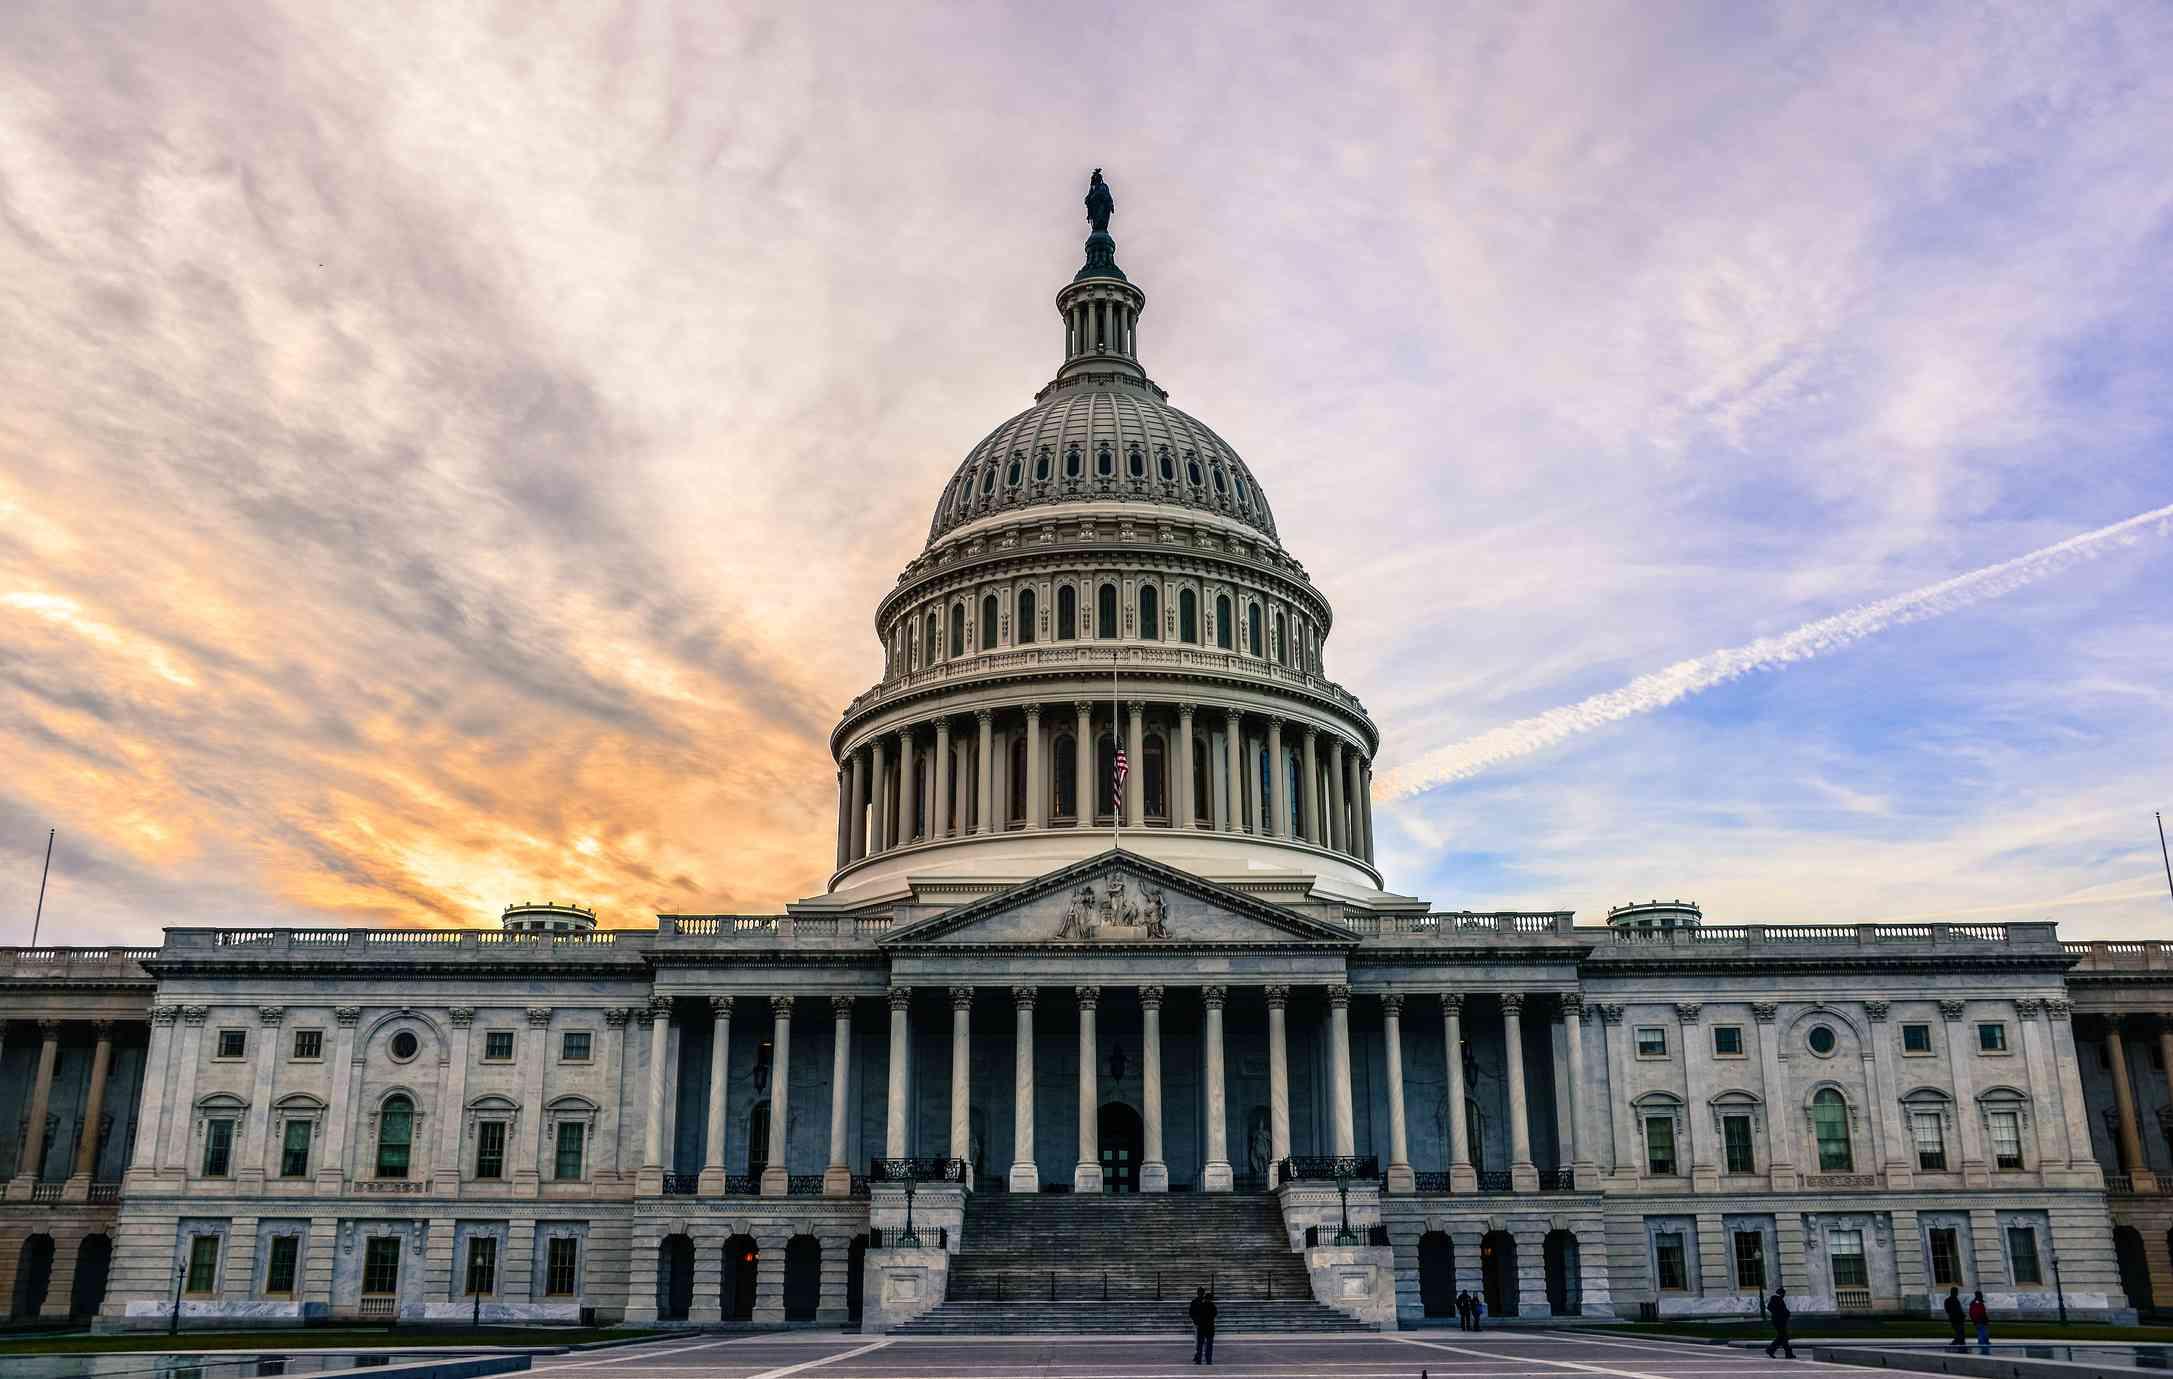 U.S. Capitol building, Washington, DC